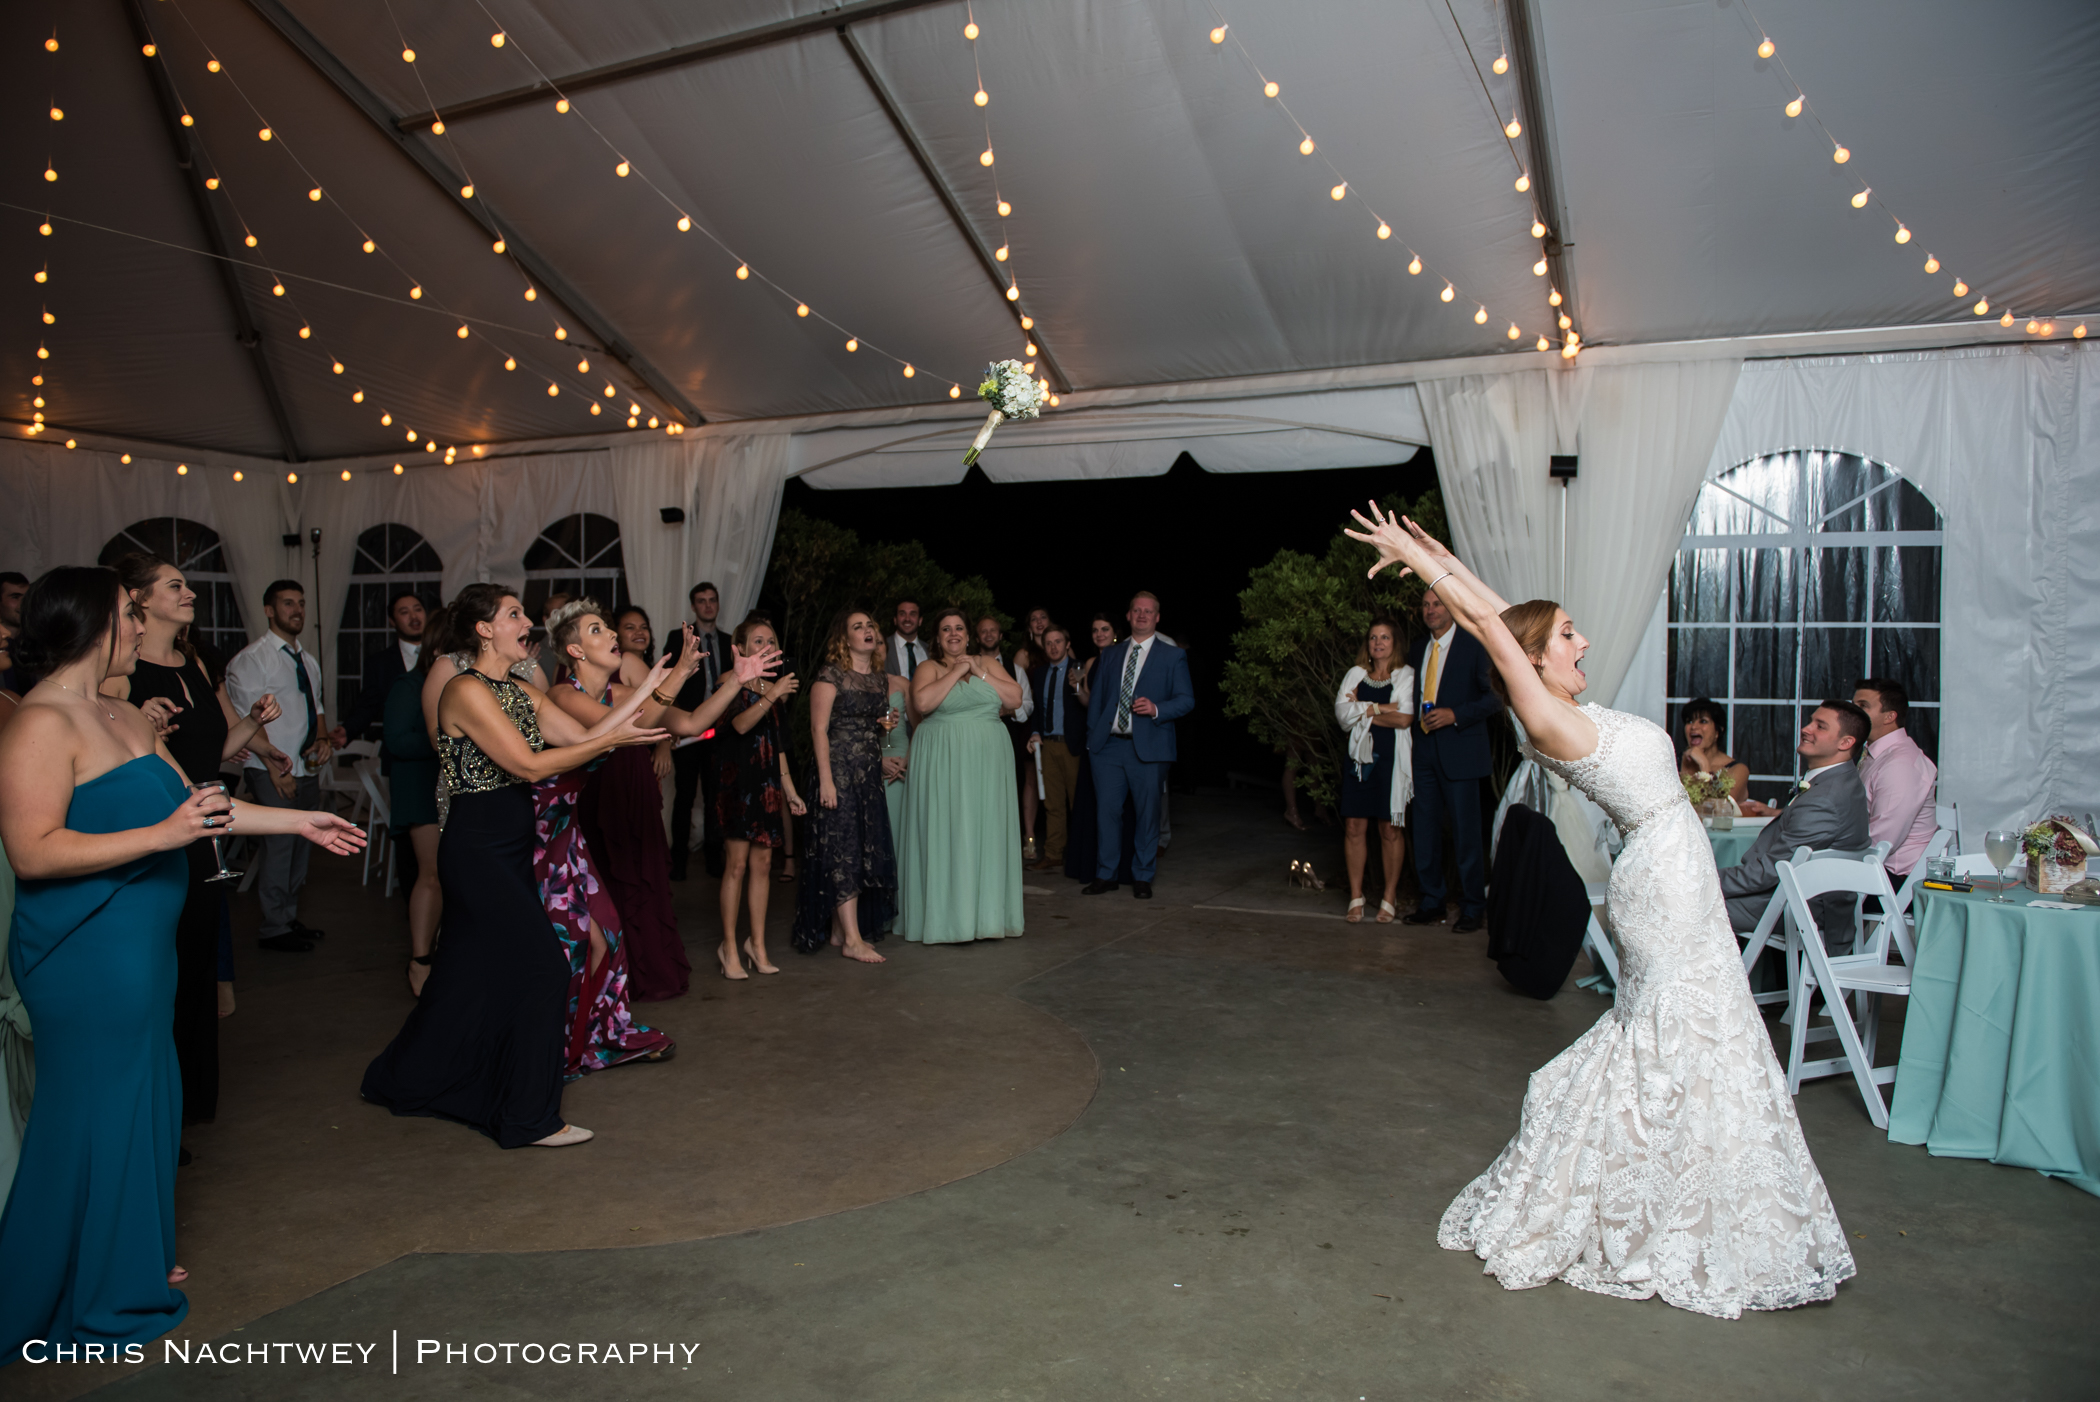 harkness-wedding-photos-chris-nachtwey-photography-2018-47.jpg